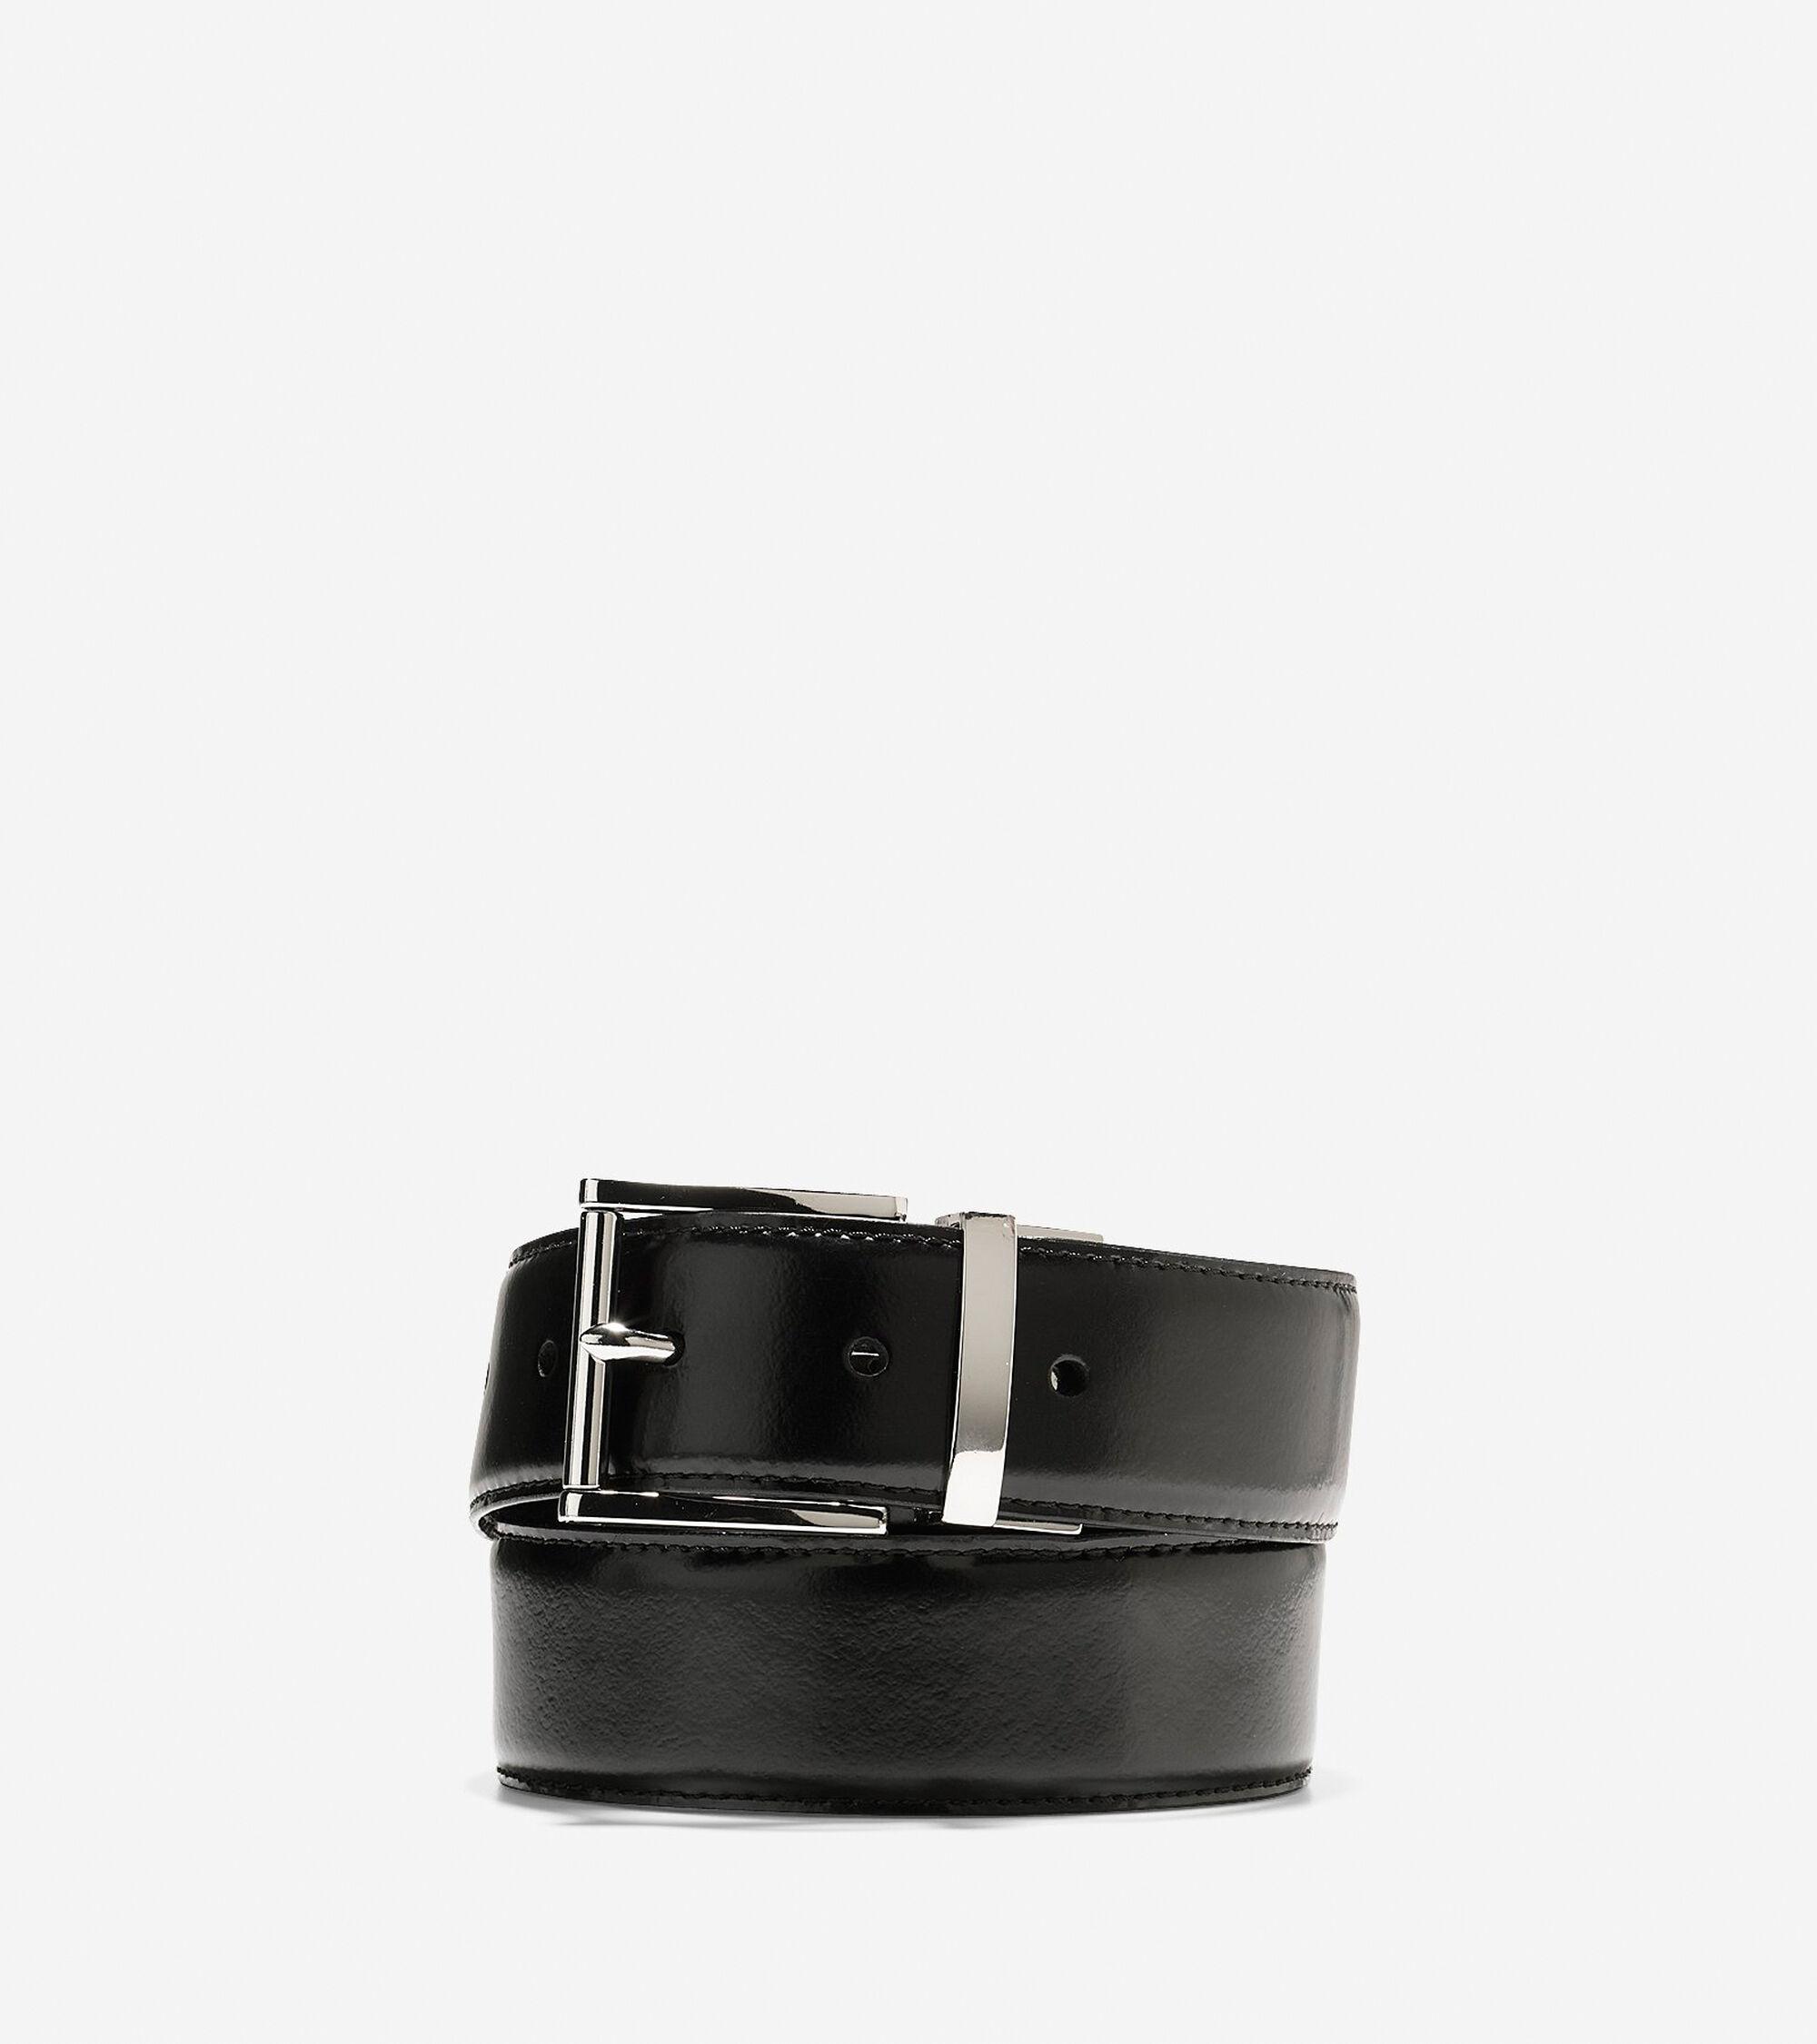 eecfb64ef4e 35mm Reversible Feather Edge Belt in Black-British Tan